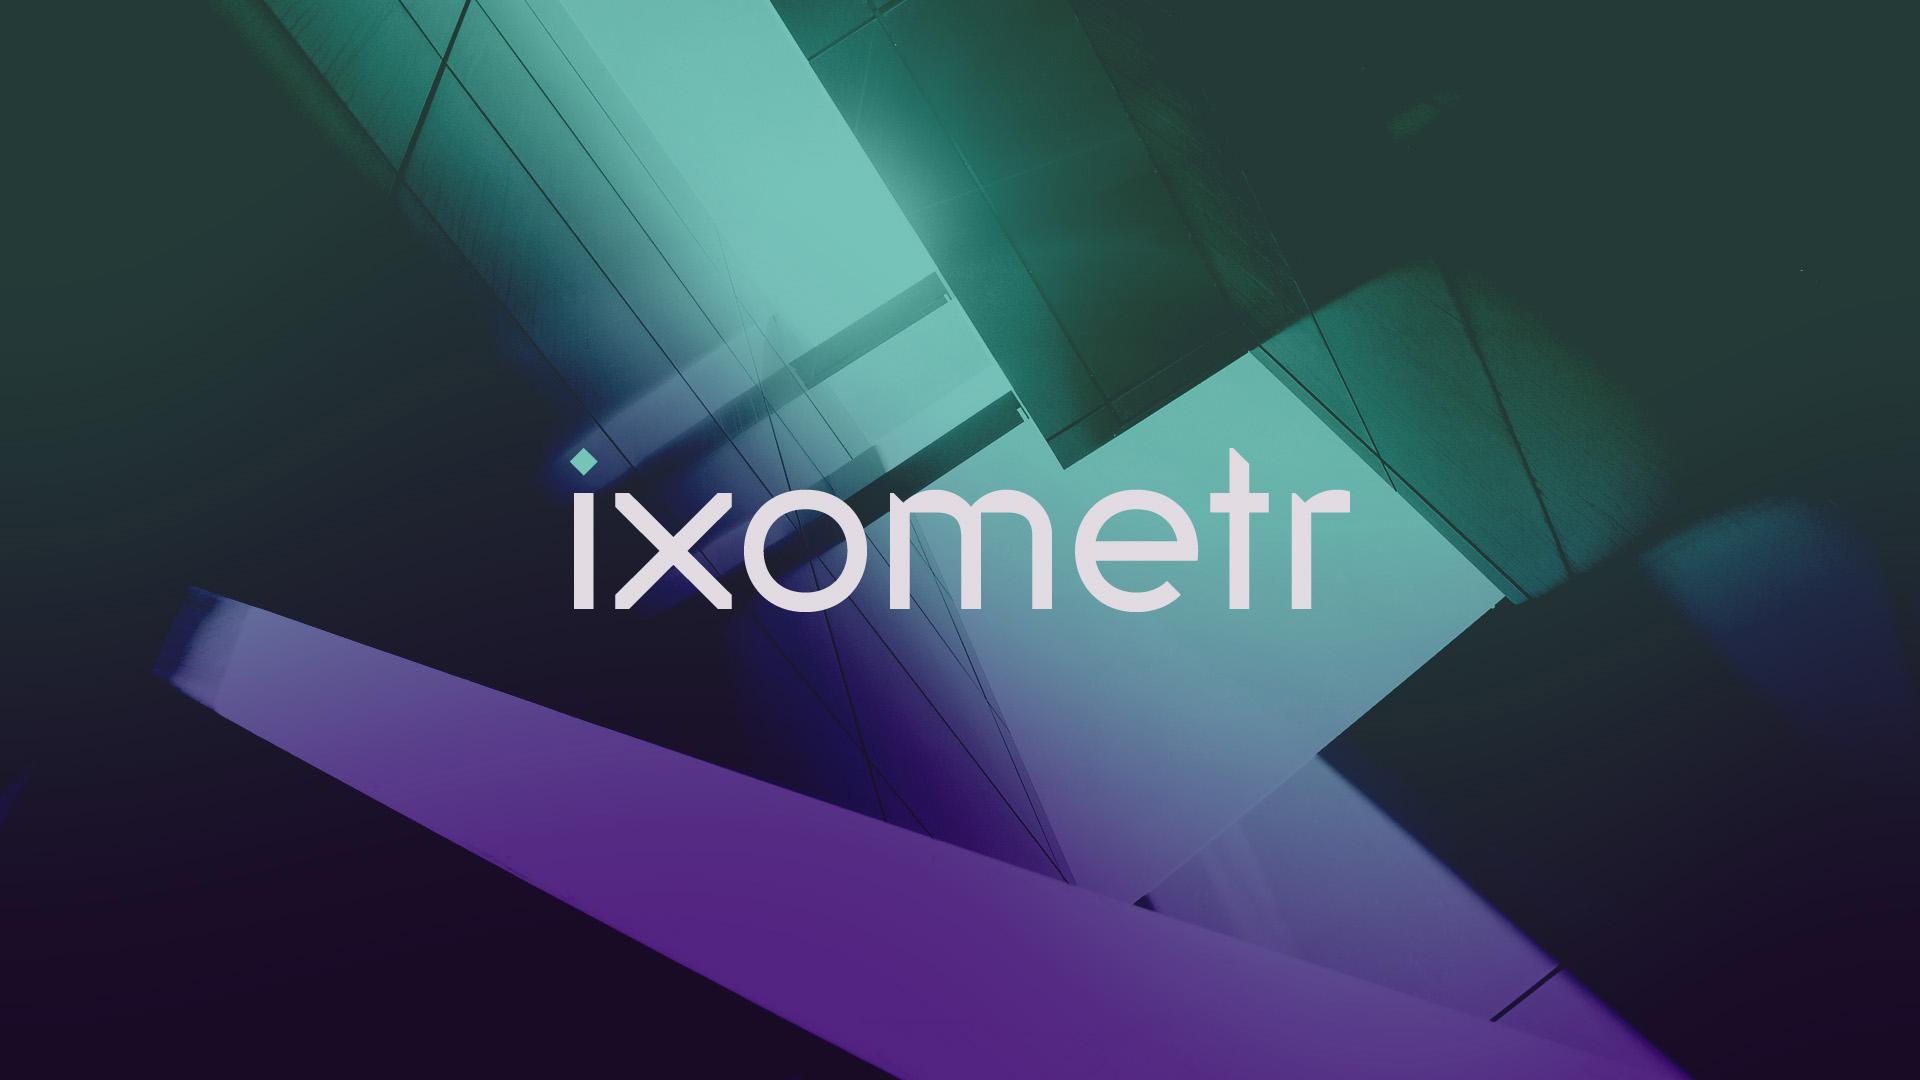 Visual Identity for the Company Ixometr by Levon Grigoryan